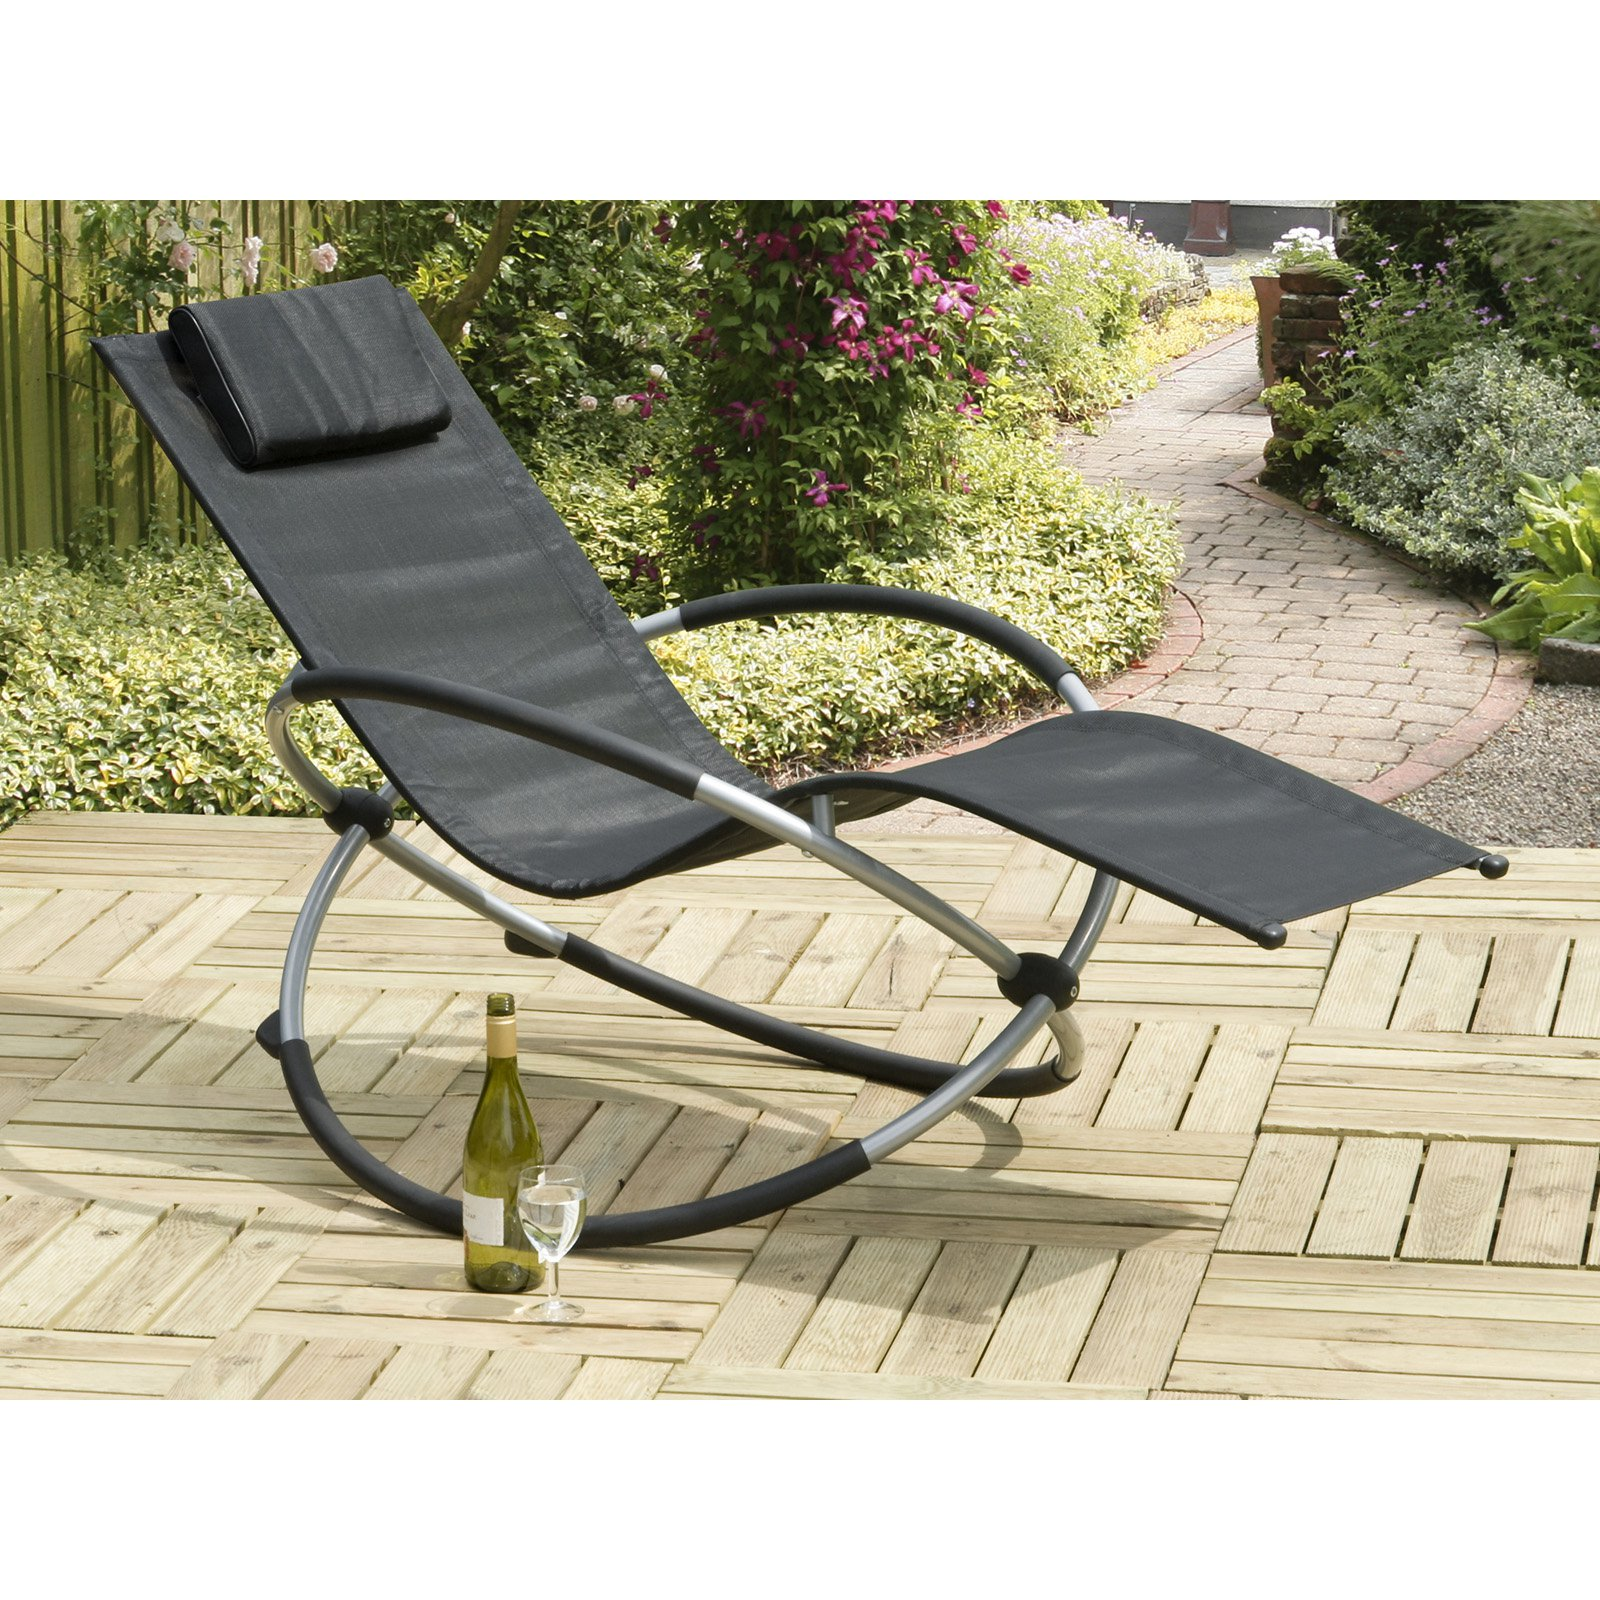 Orbit Relaxer Black Rocking Steel Chair